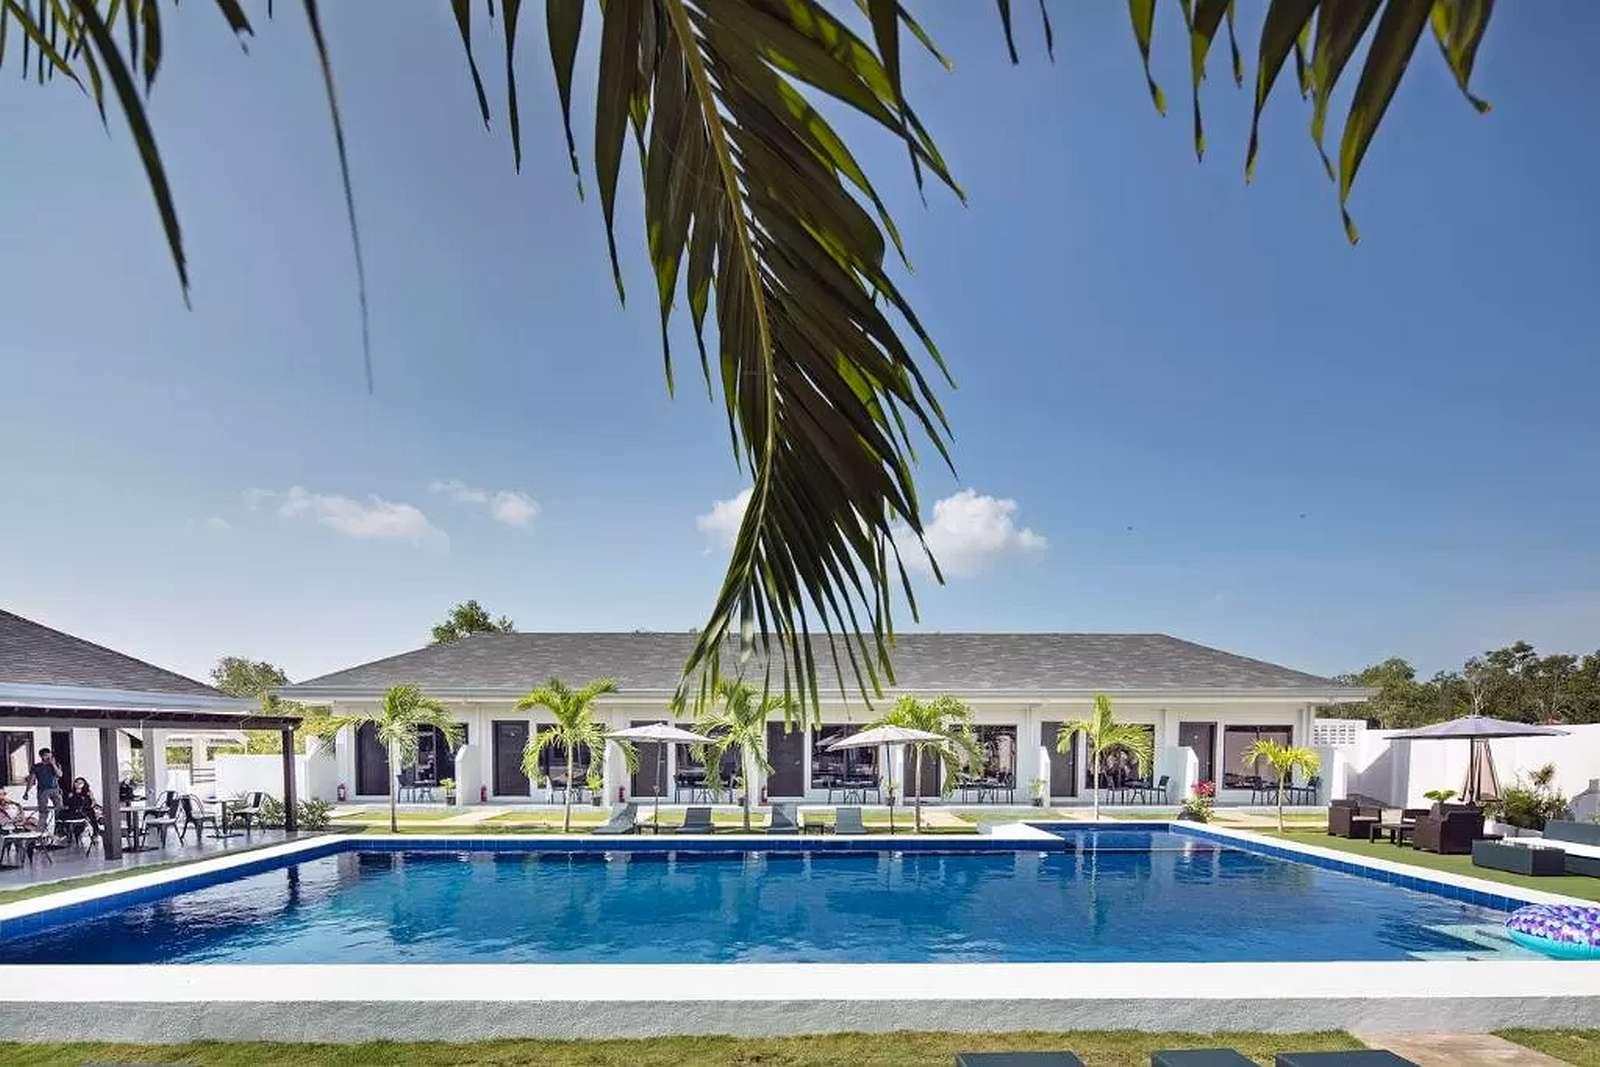 Ohana panglao resort bohol book here for discount rates (16)